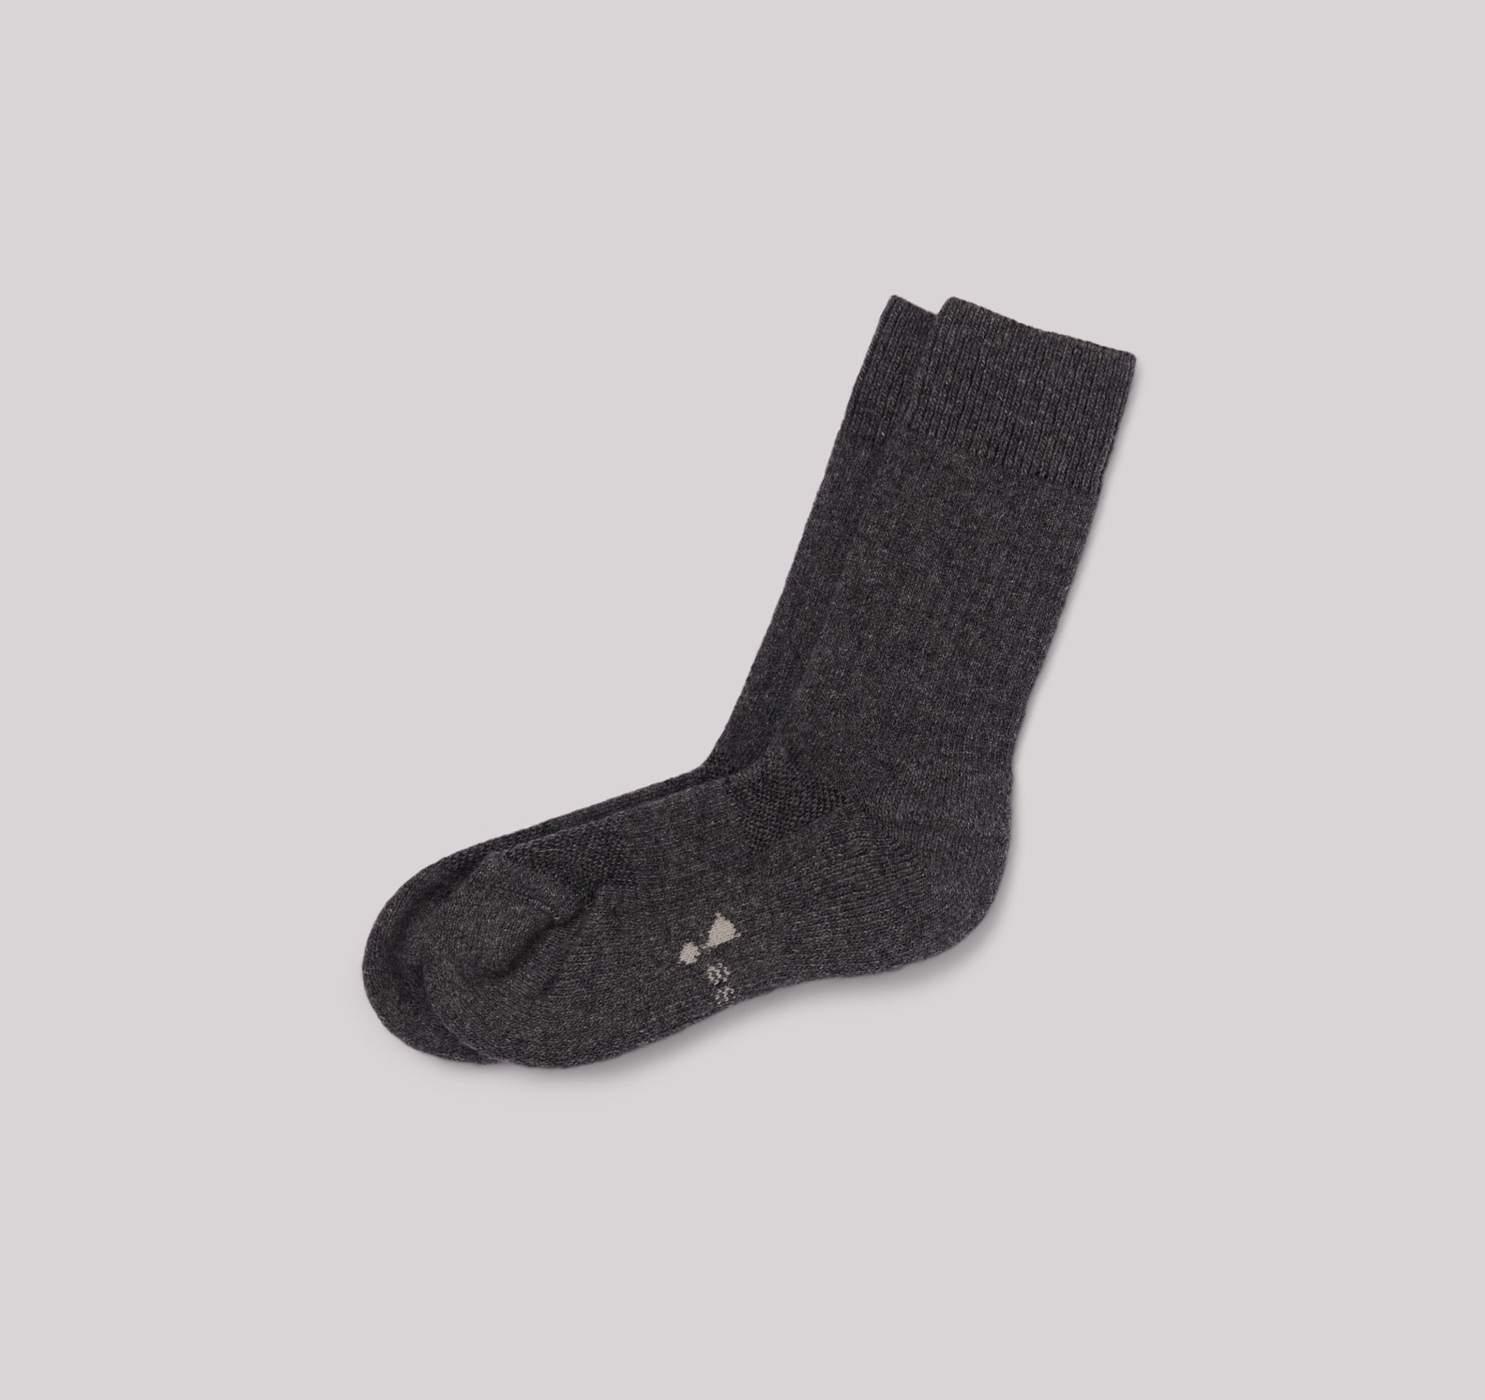 Recycled Wool Socks